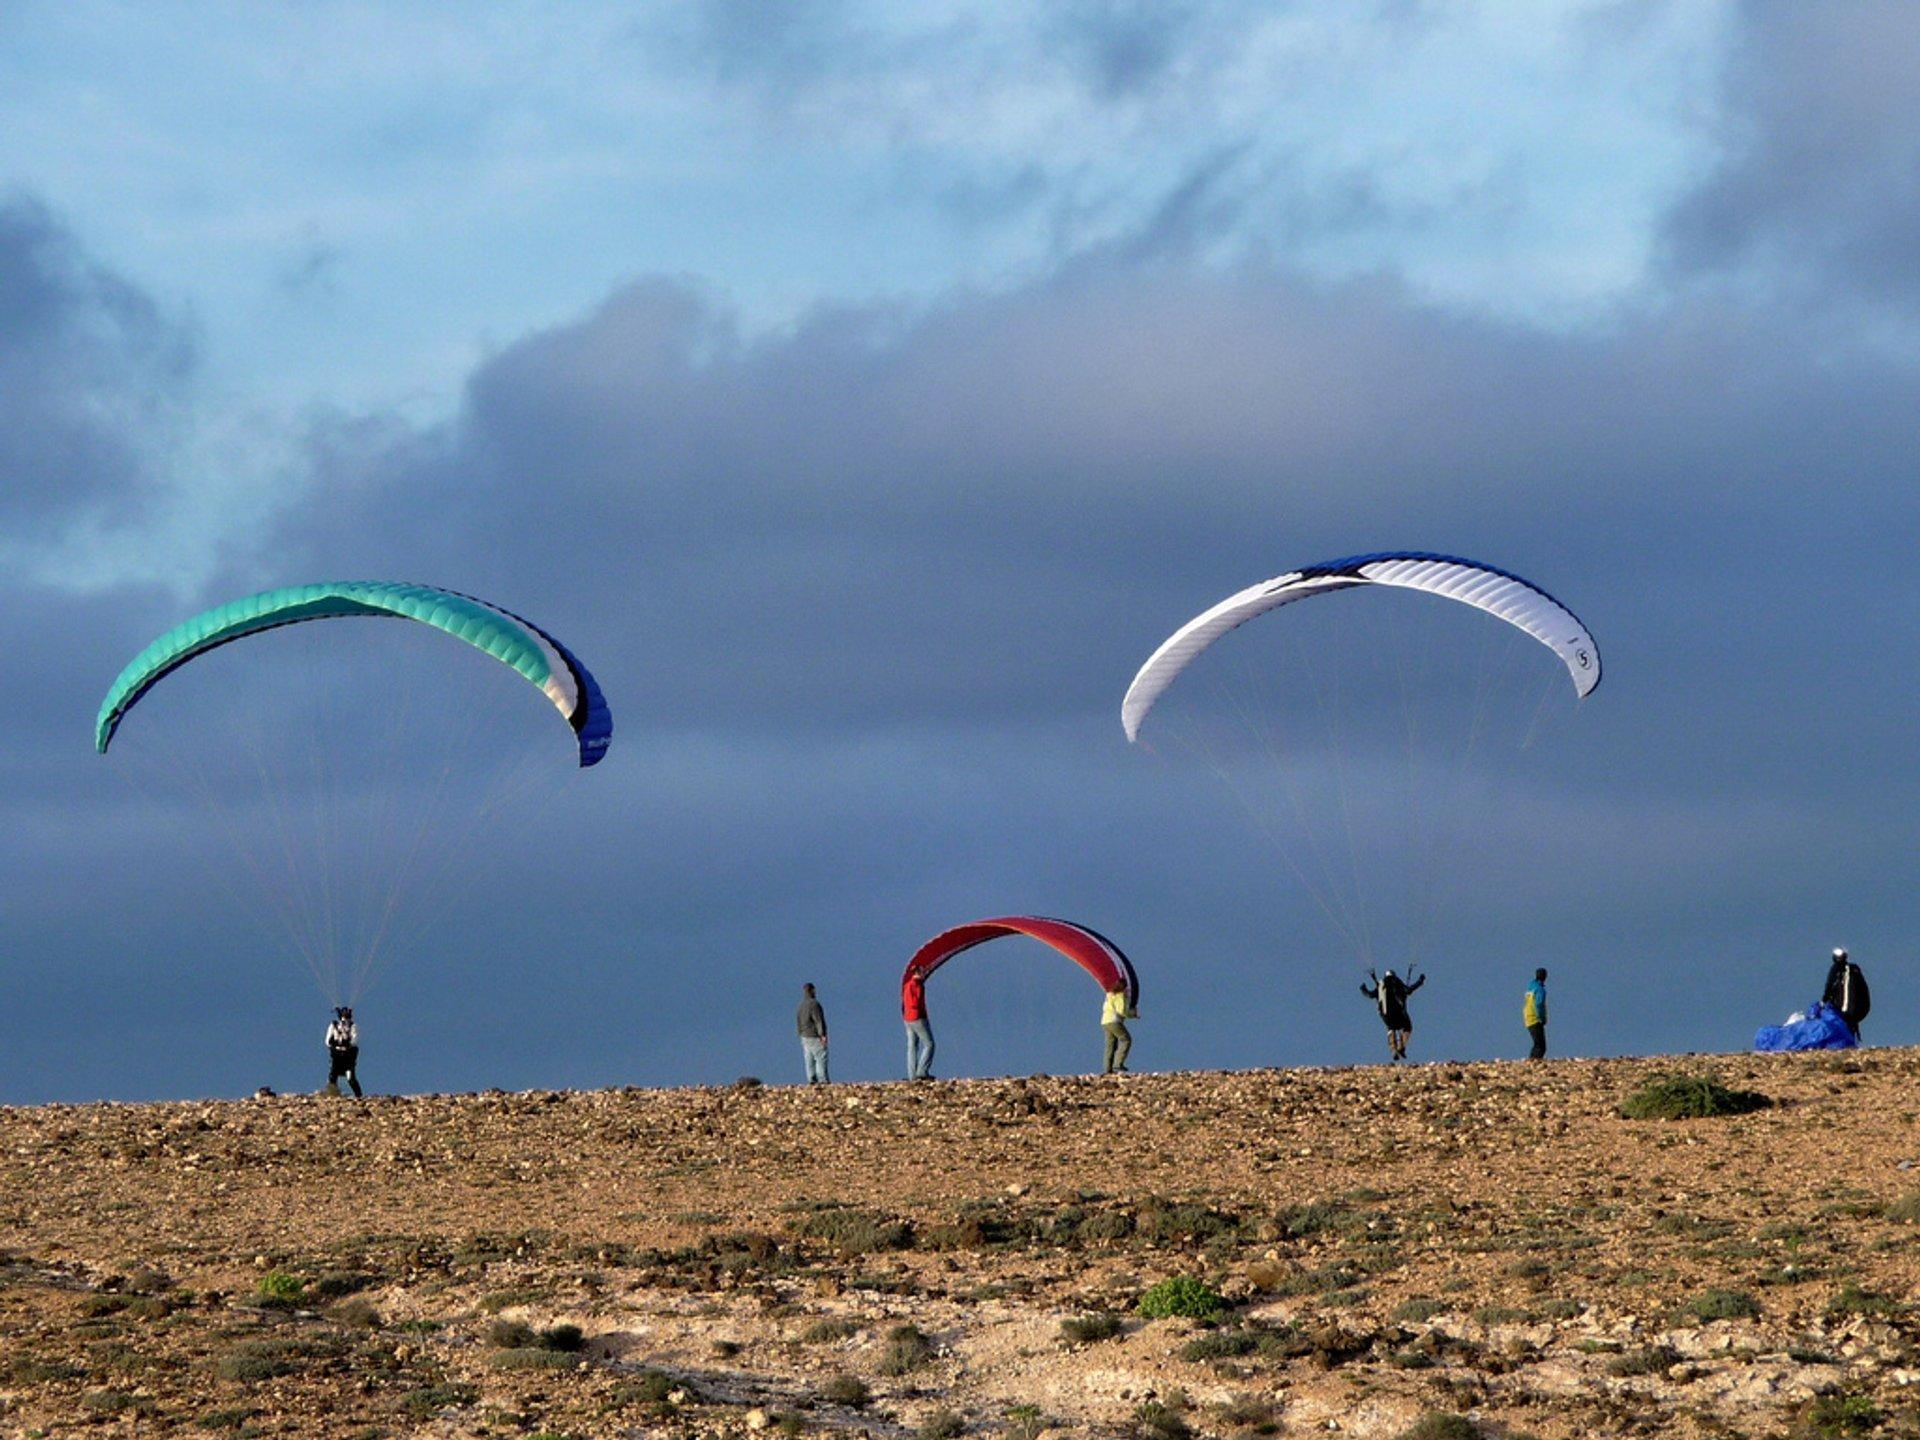 Paragliding in Canary Islands - Best Season 2019